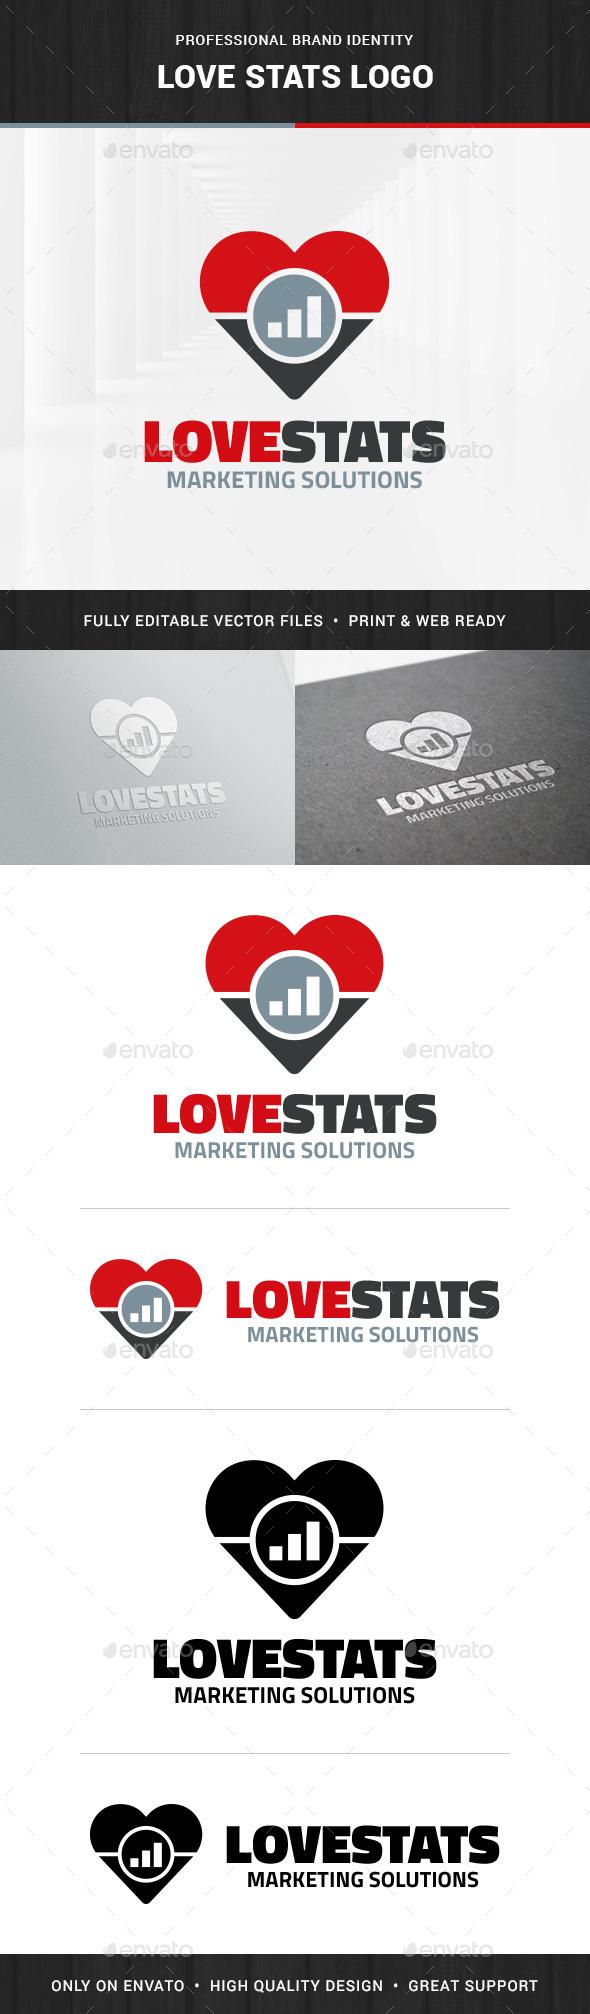 Love Stats Logo Template